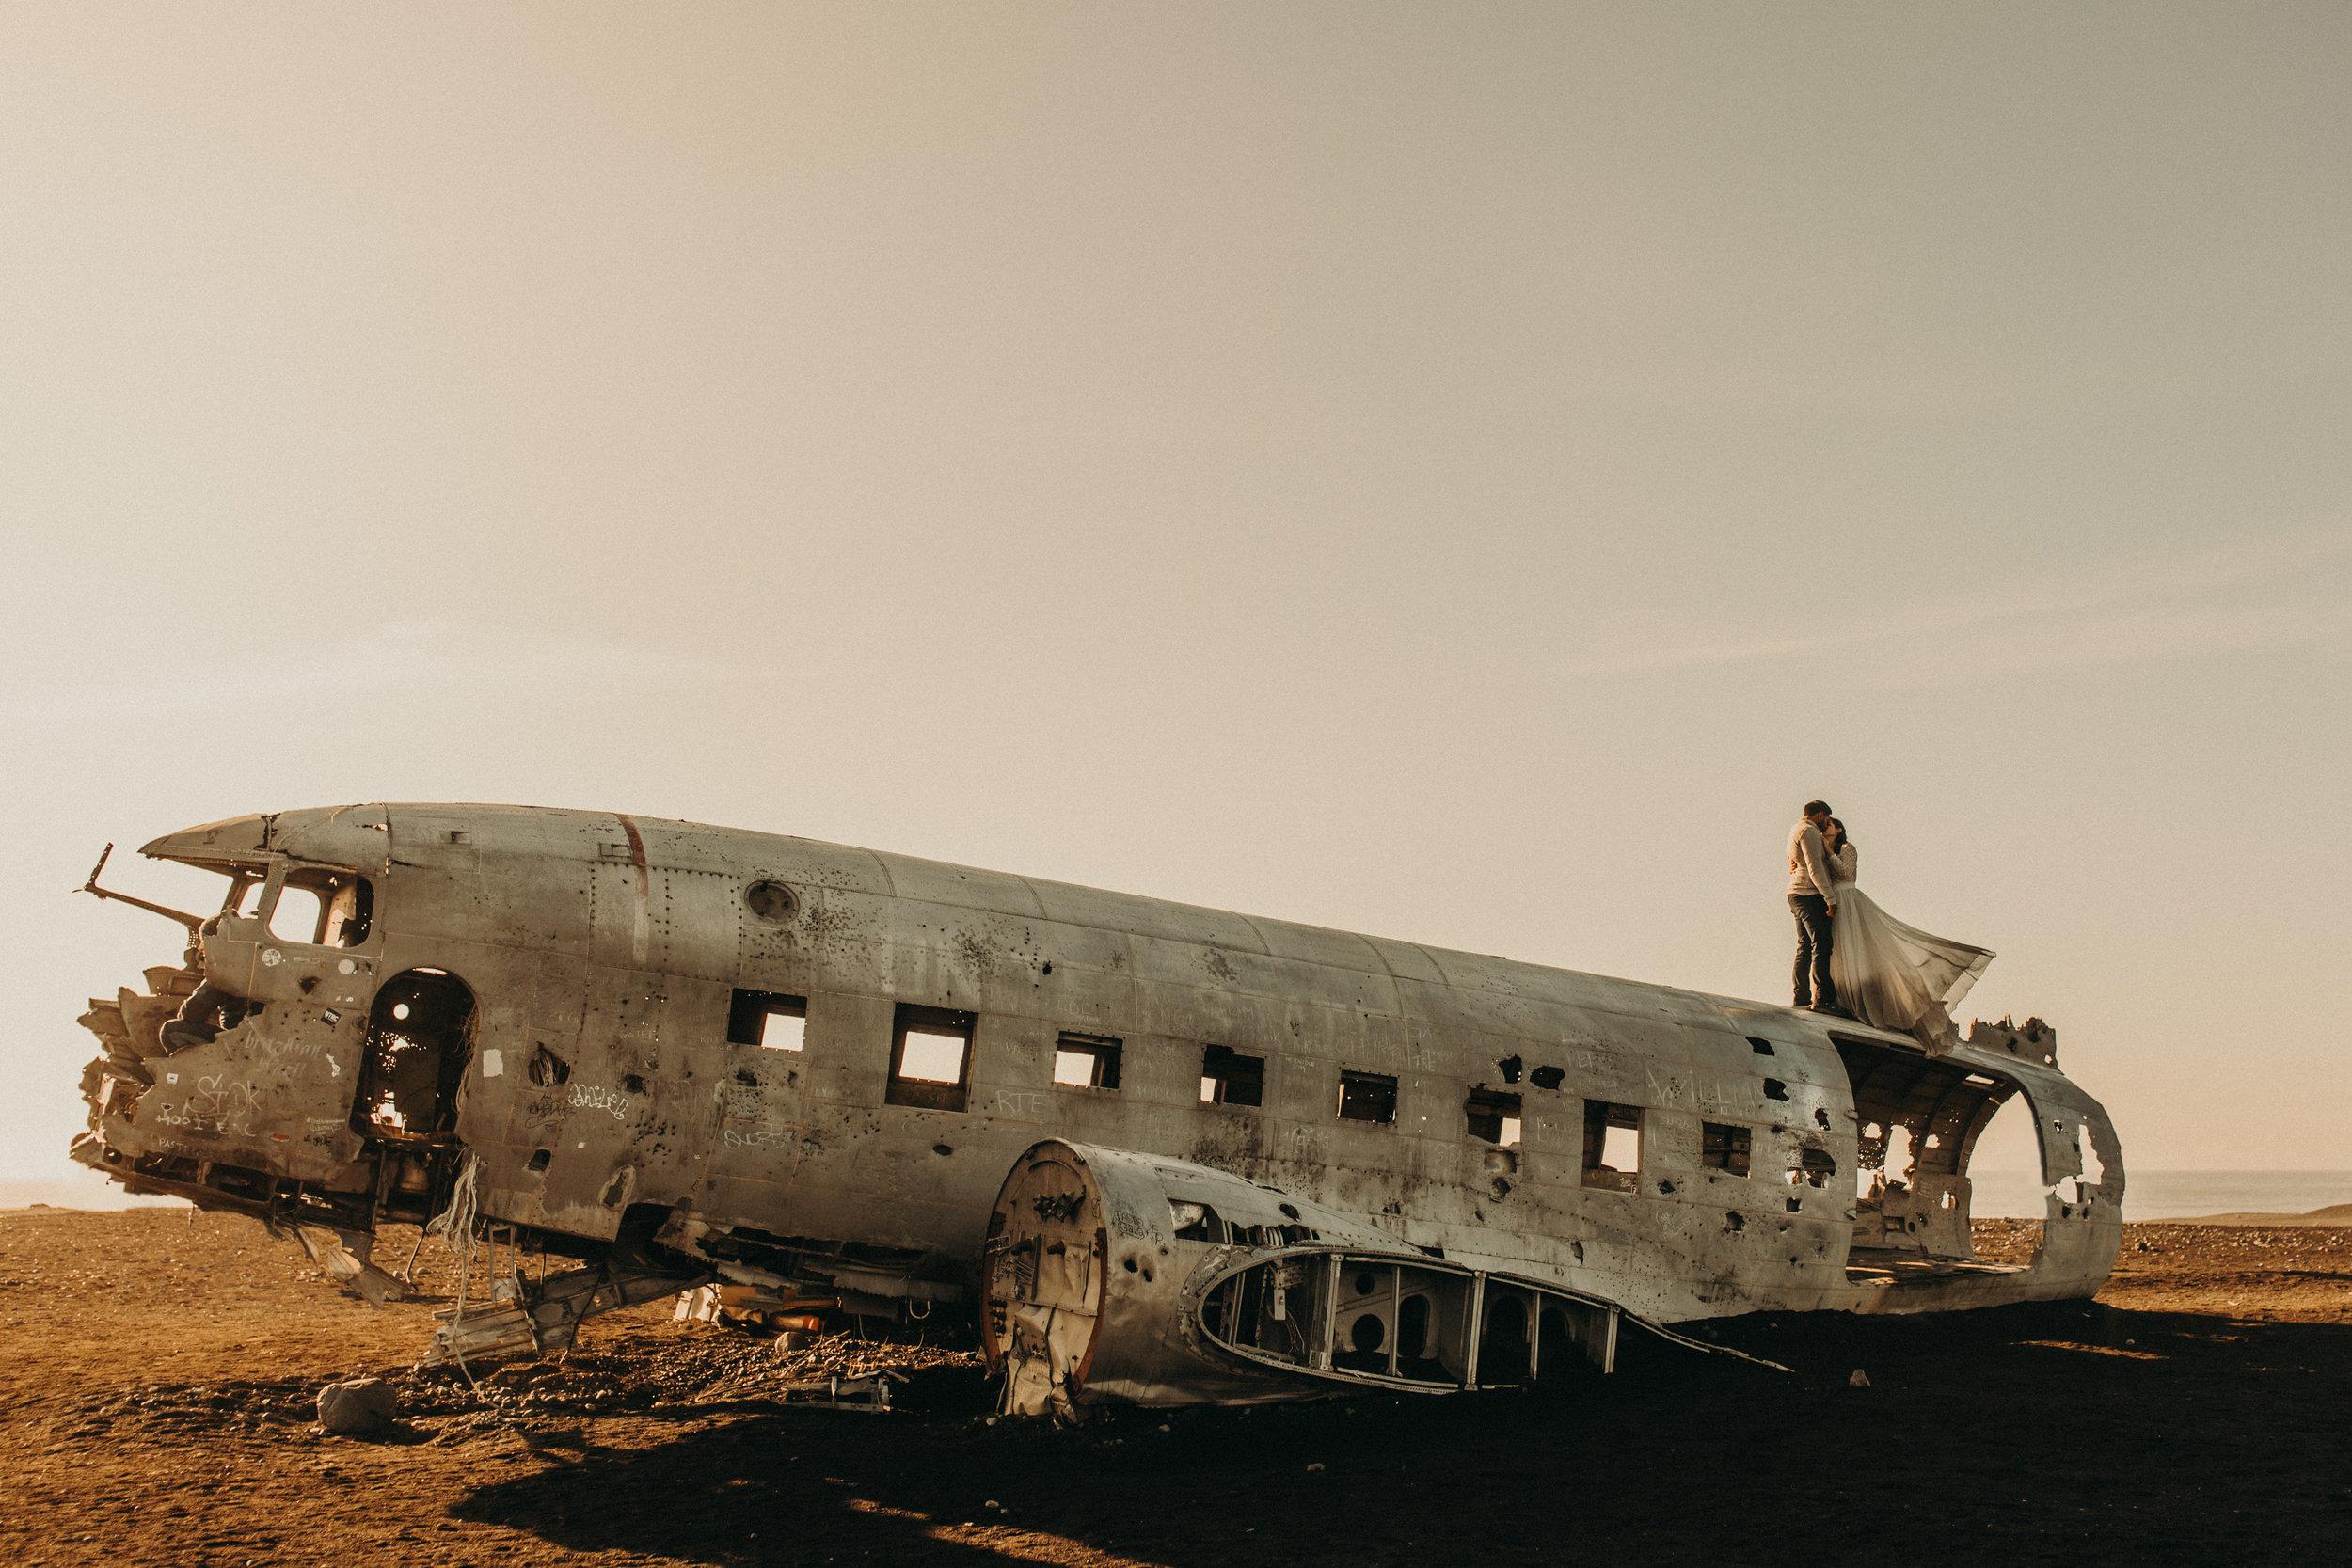 iceland-plane-wreck-elopement